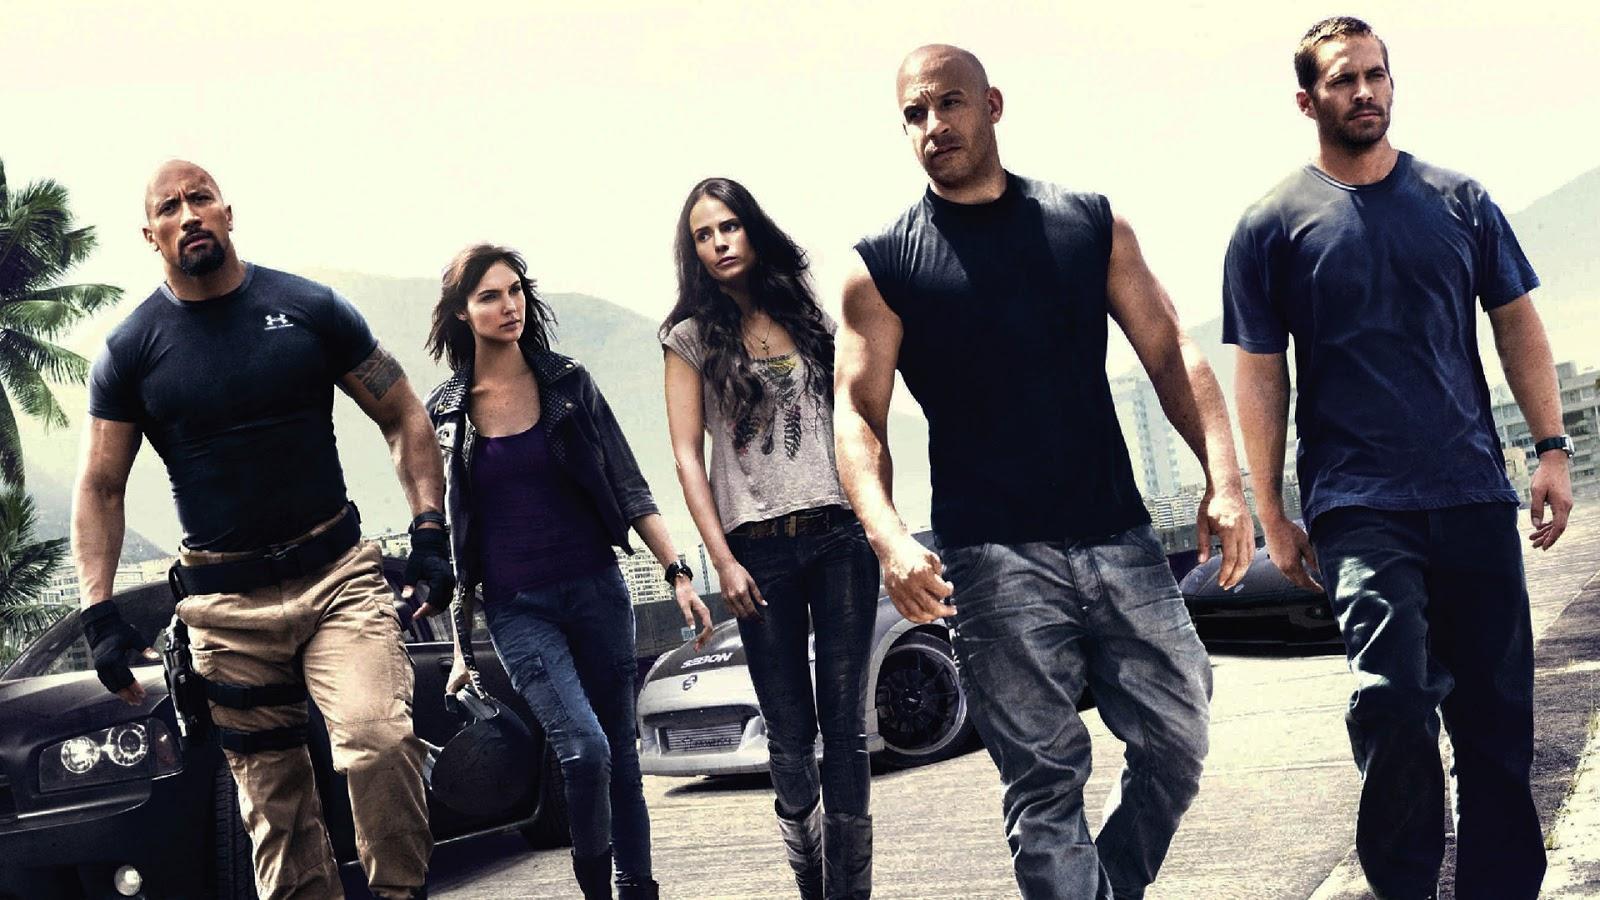 Todas las películas de Fast and Furious, clasificadas de peor a mejor 6